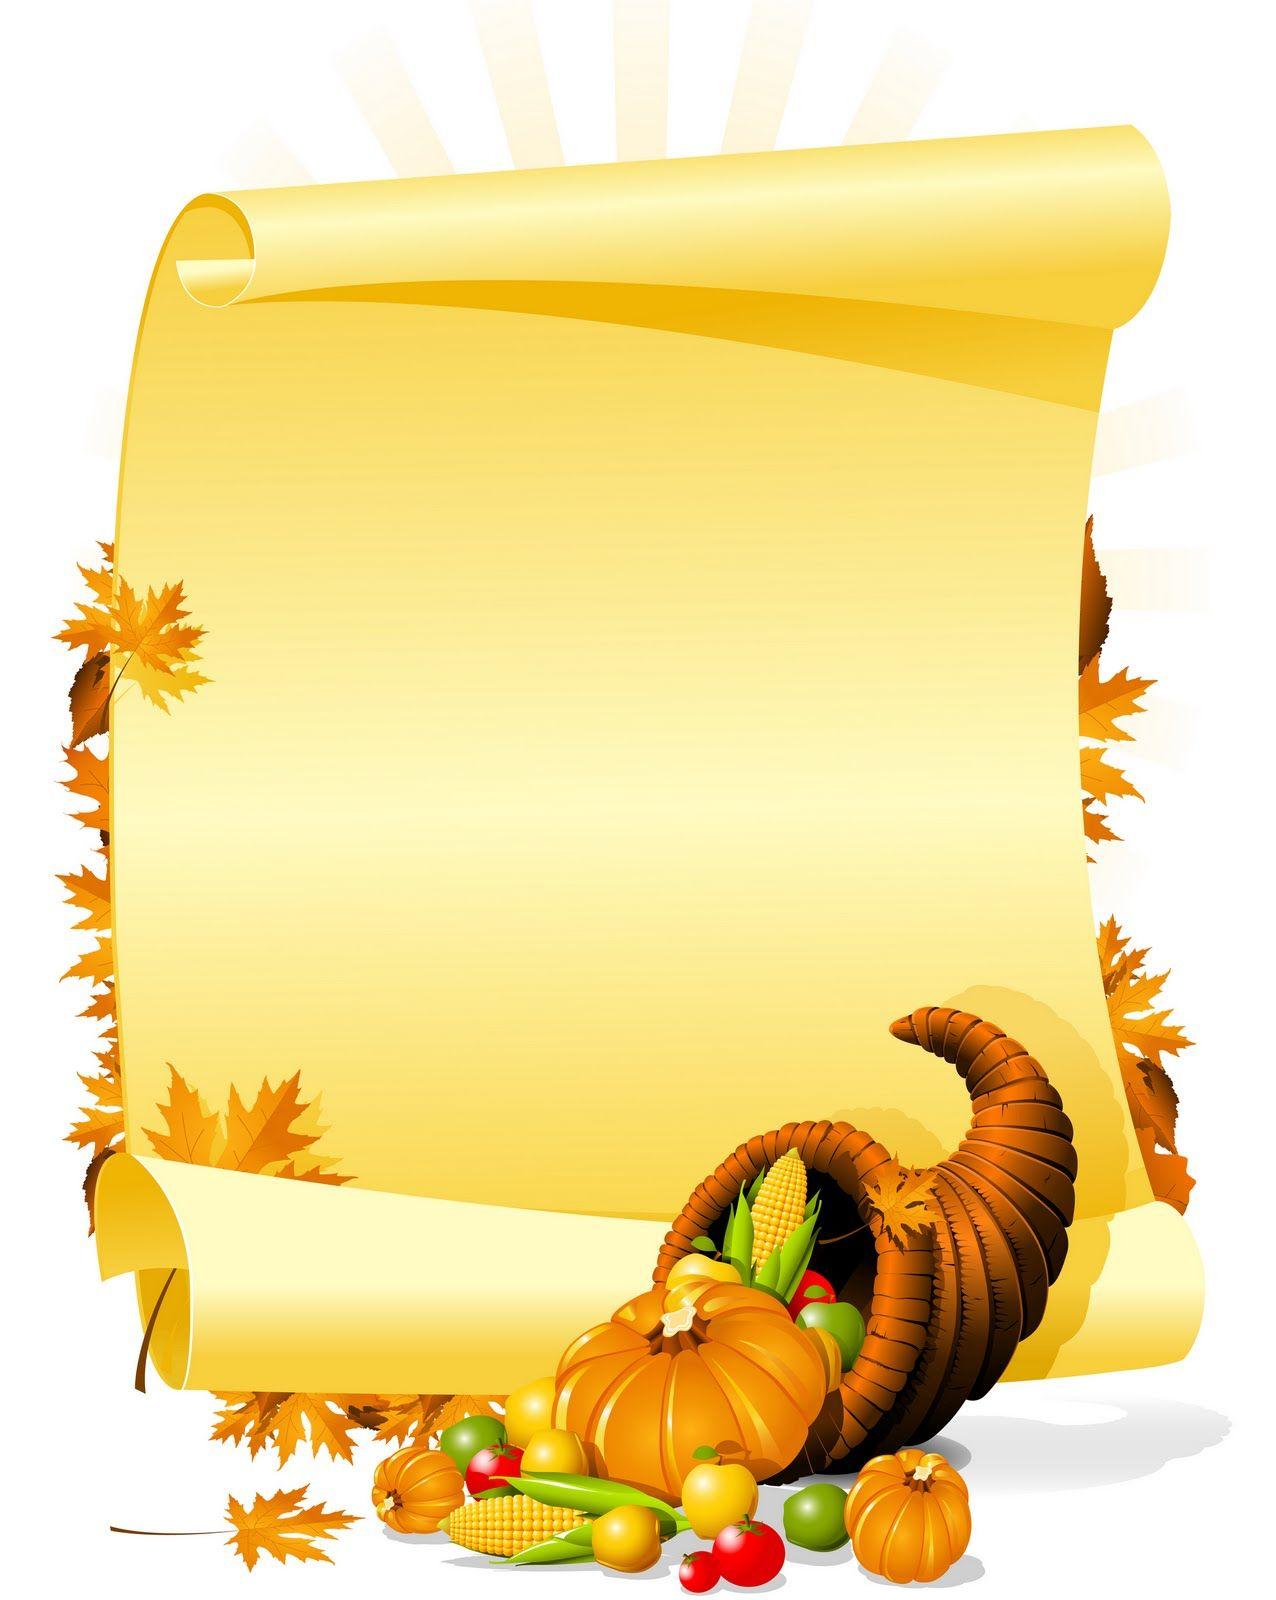 Blog Archive Happy Thanksgiving Thanksgiving Clip Art Free Thanksgiving Wallpaper Turkey Clip Art